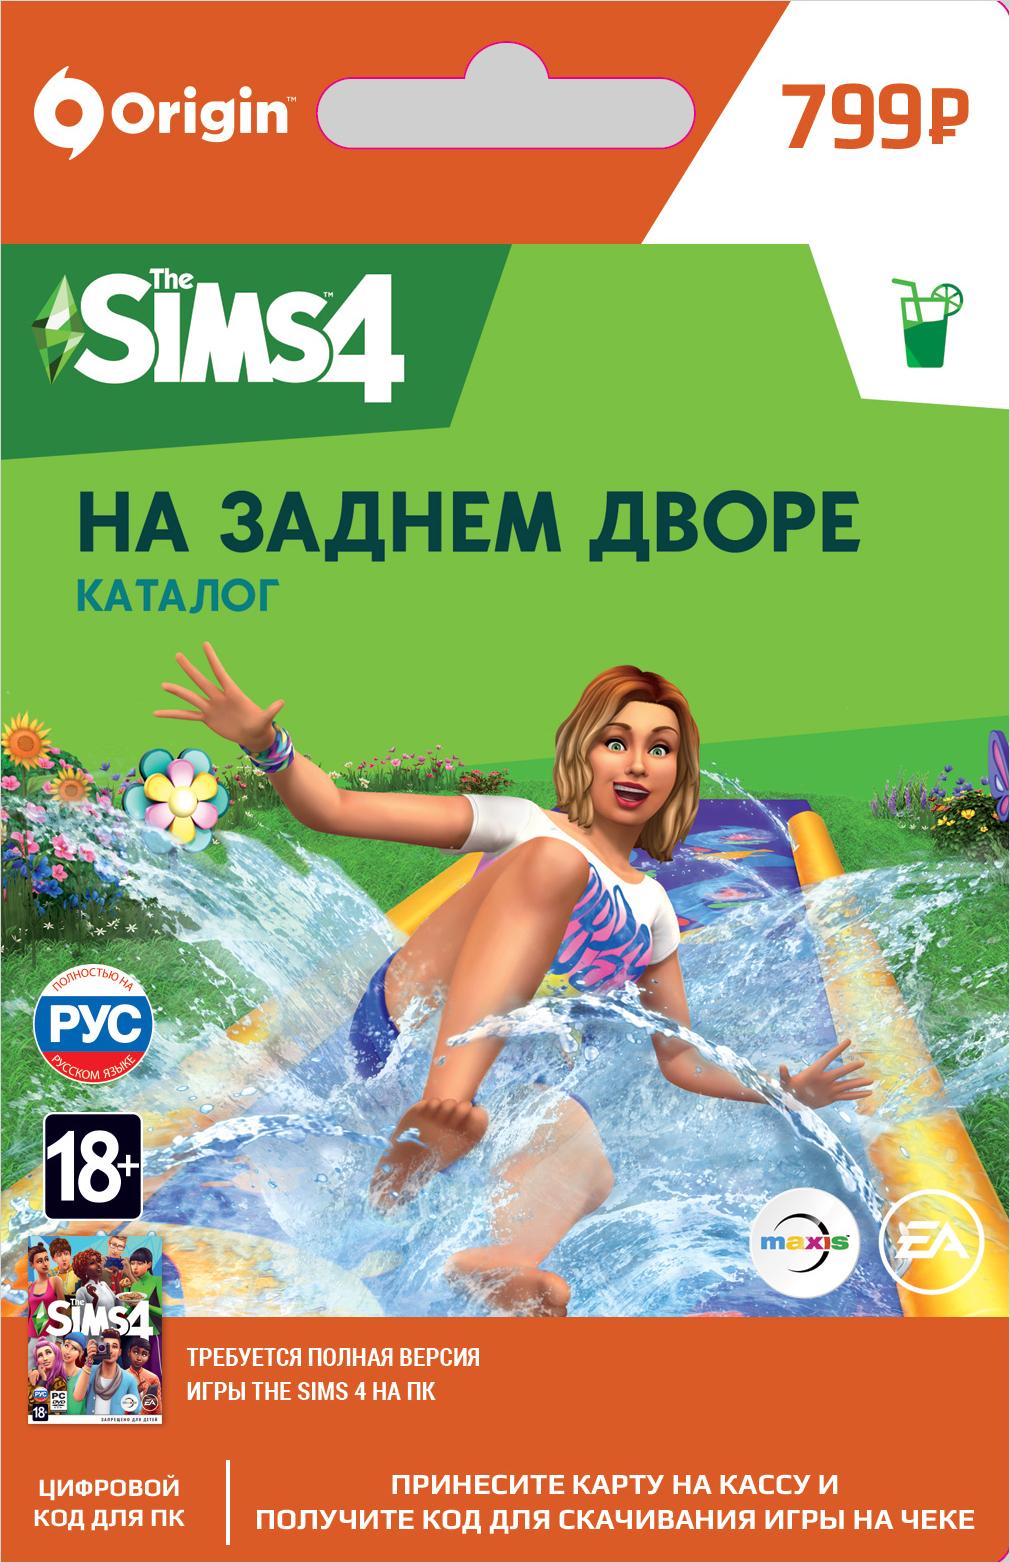 Фото - The Sims 4 На заднем дворе. Каталог [PC, Цифровая версия] (Цифровая версия) agatha christie the abc murders [pc цифровая версия] цифровая версия